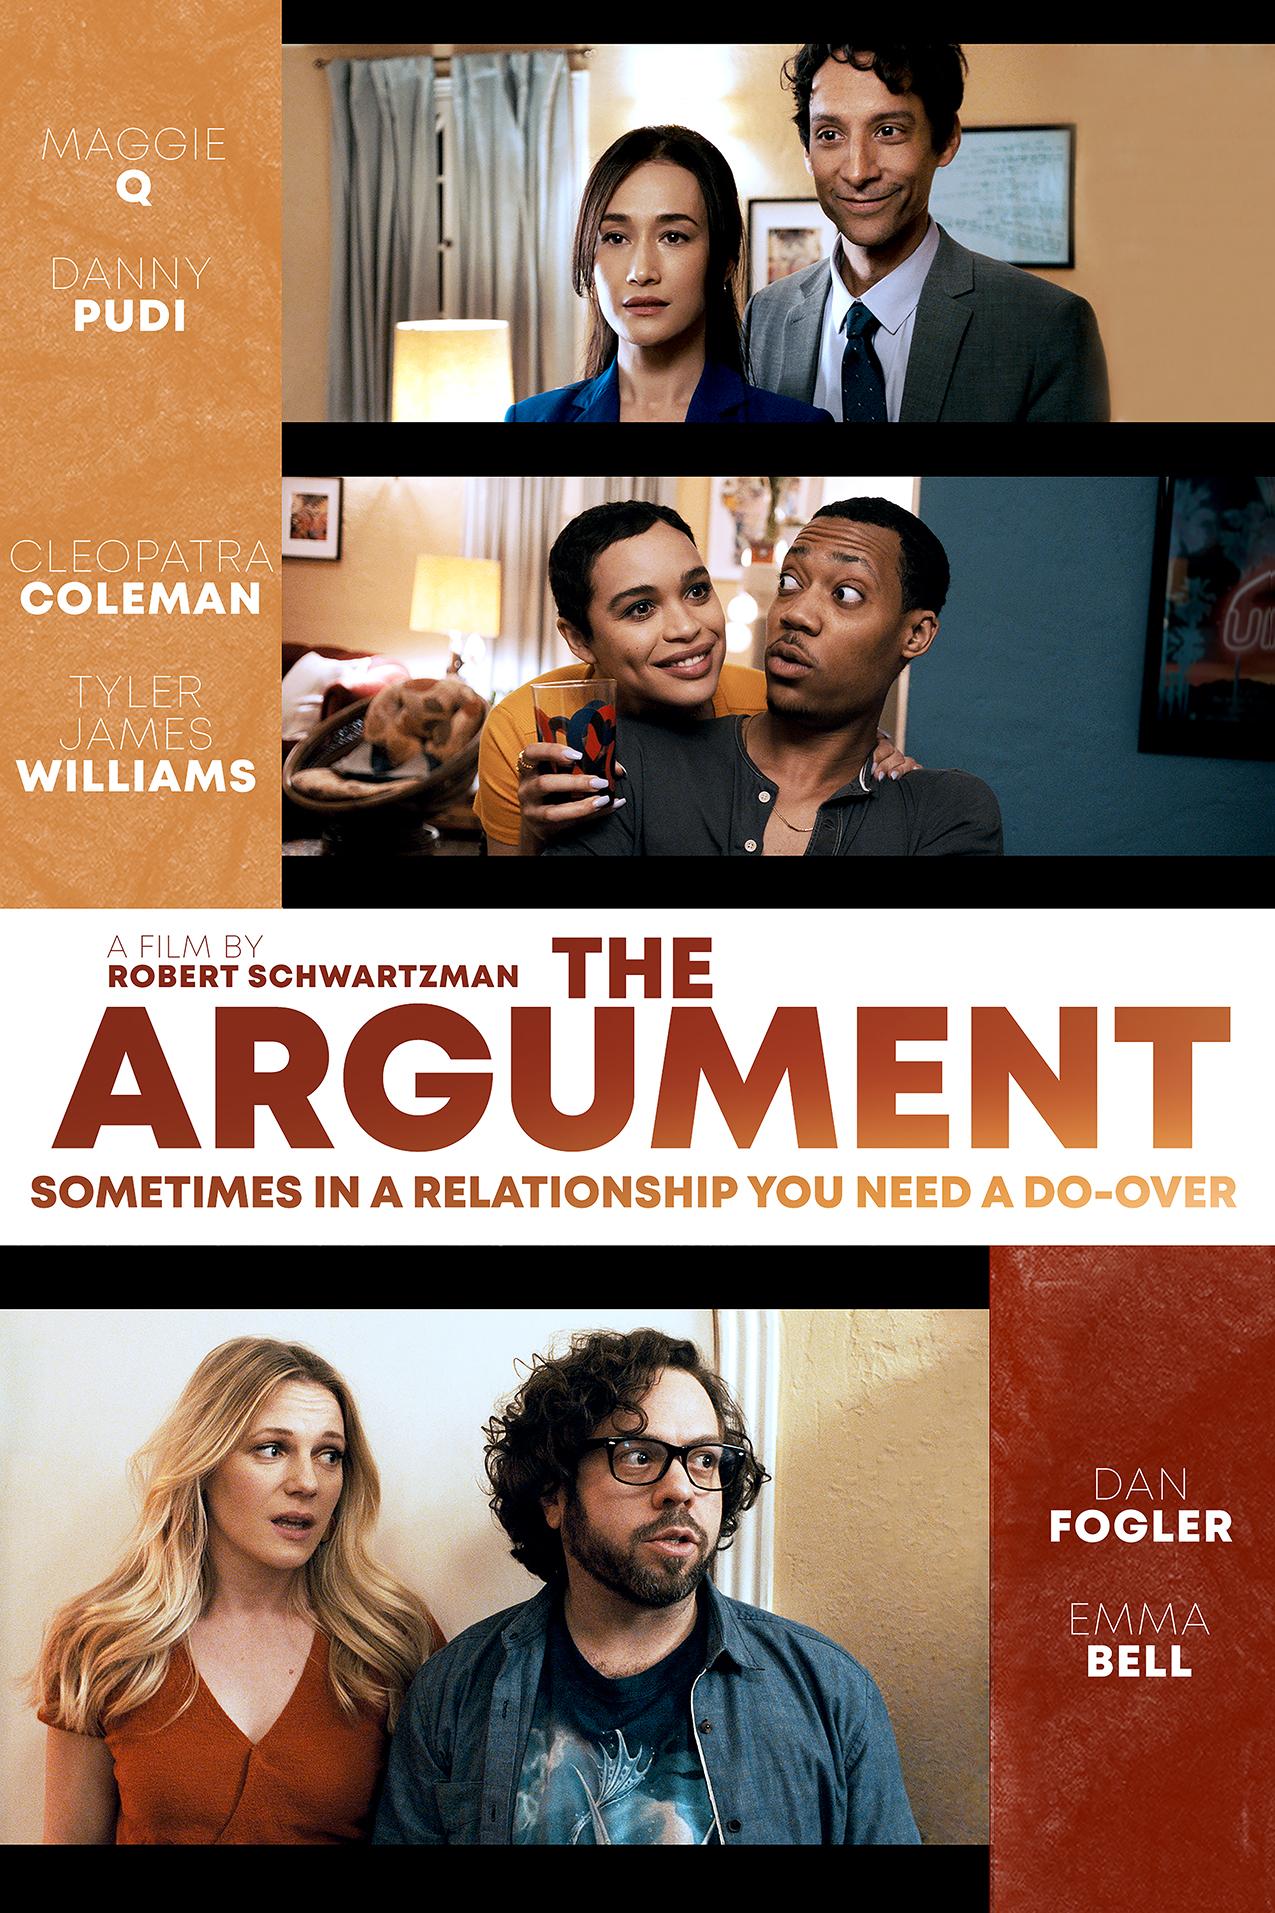 Emma Bell, Dan Fogler, Maggie Q, Cleopatra Coleman, Tyler James Williams, and Danny Pudi in The Argument (2020)